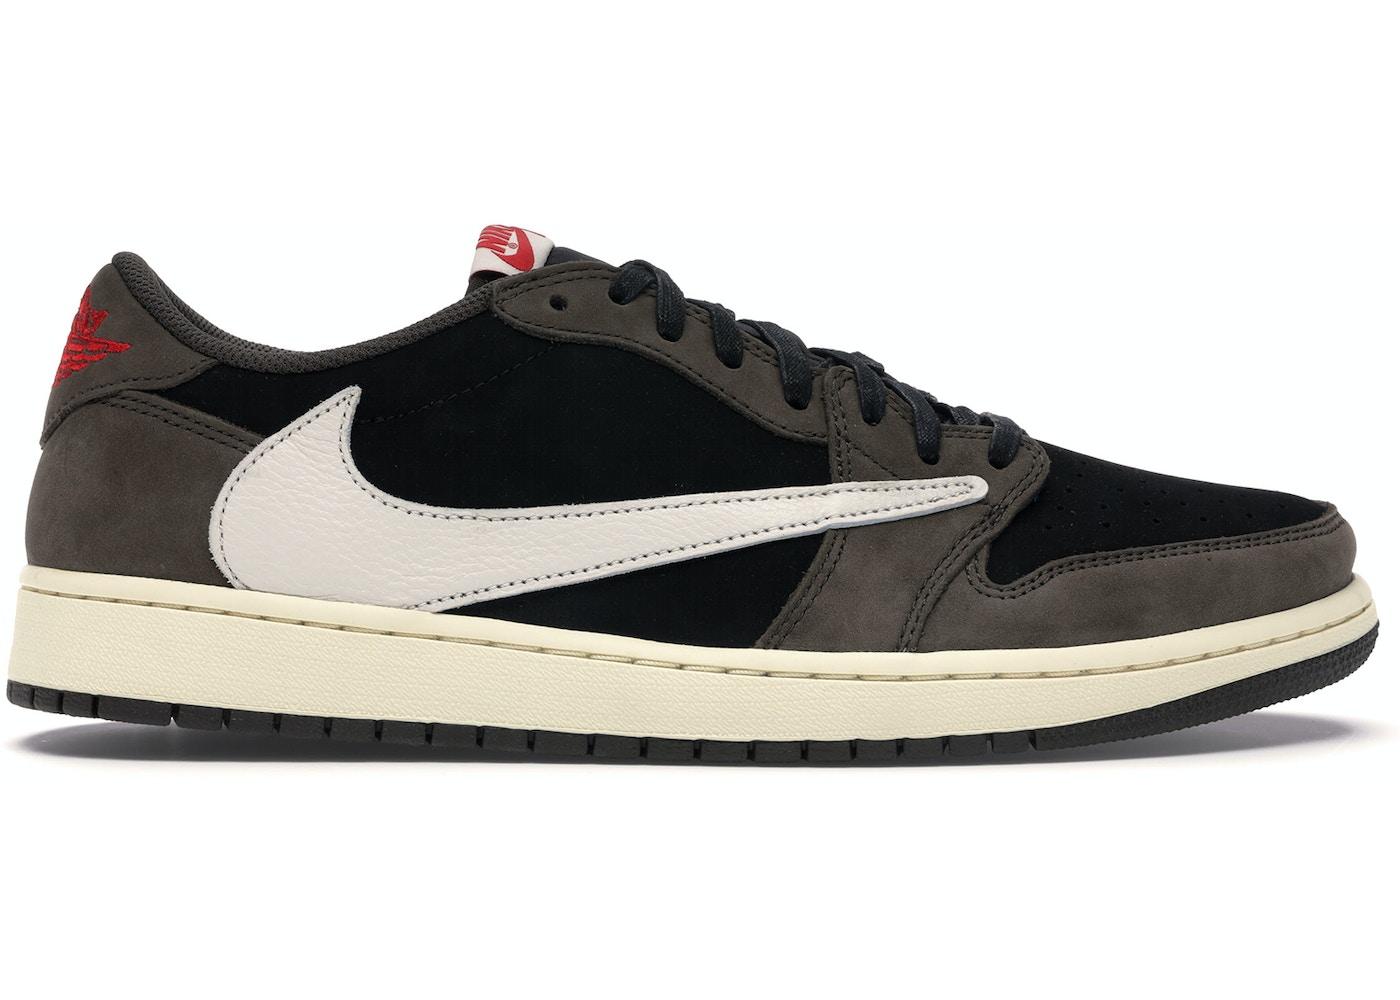 the latest c7f8b f02c4 Buy Air Jordan 1 Shoes & Deadstock Sneakers